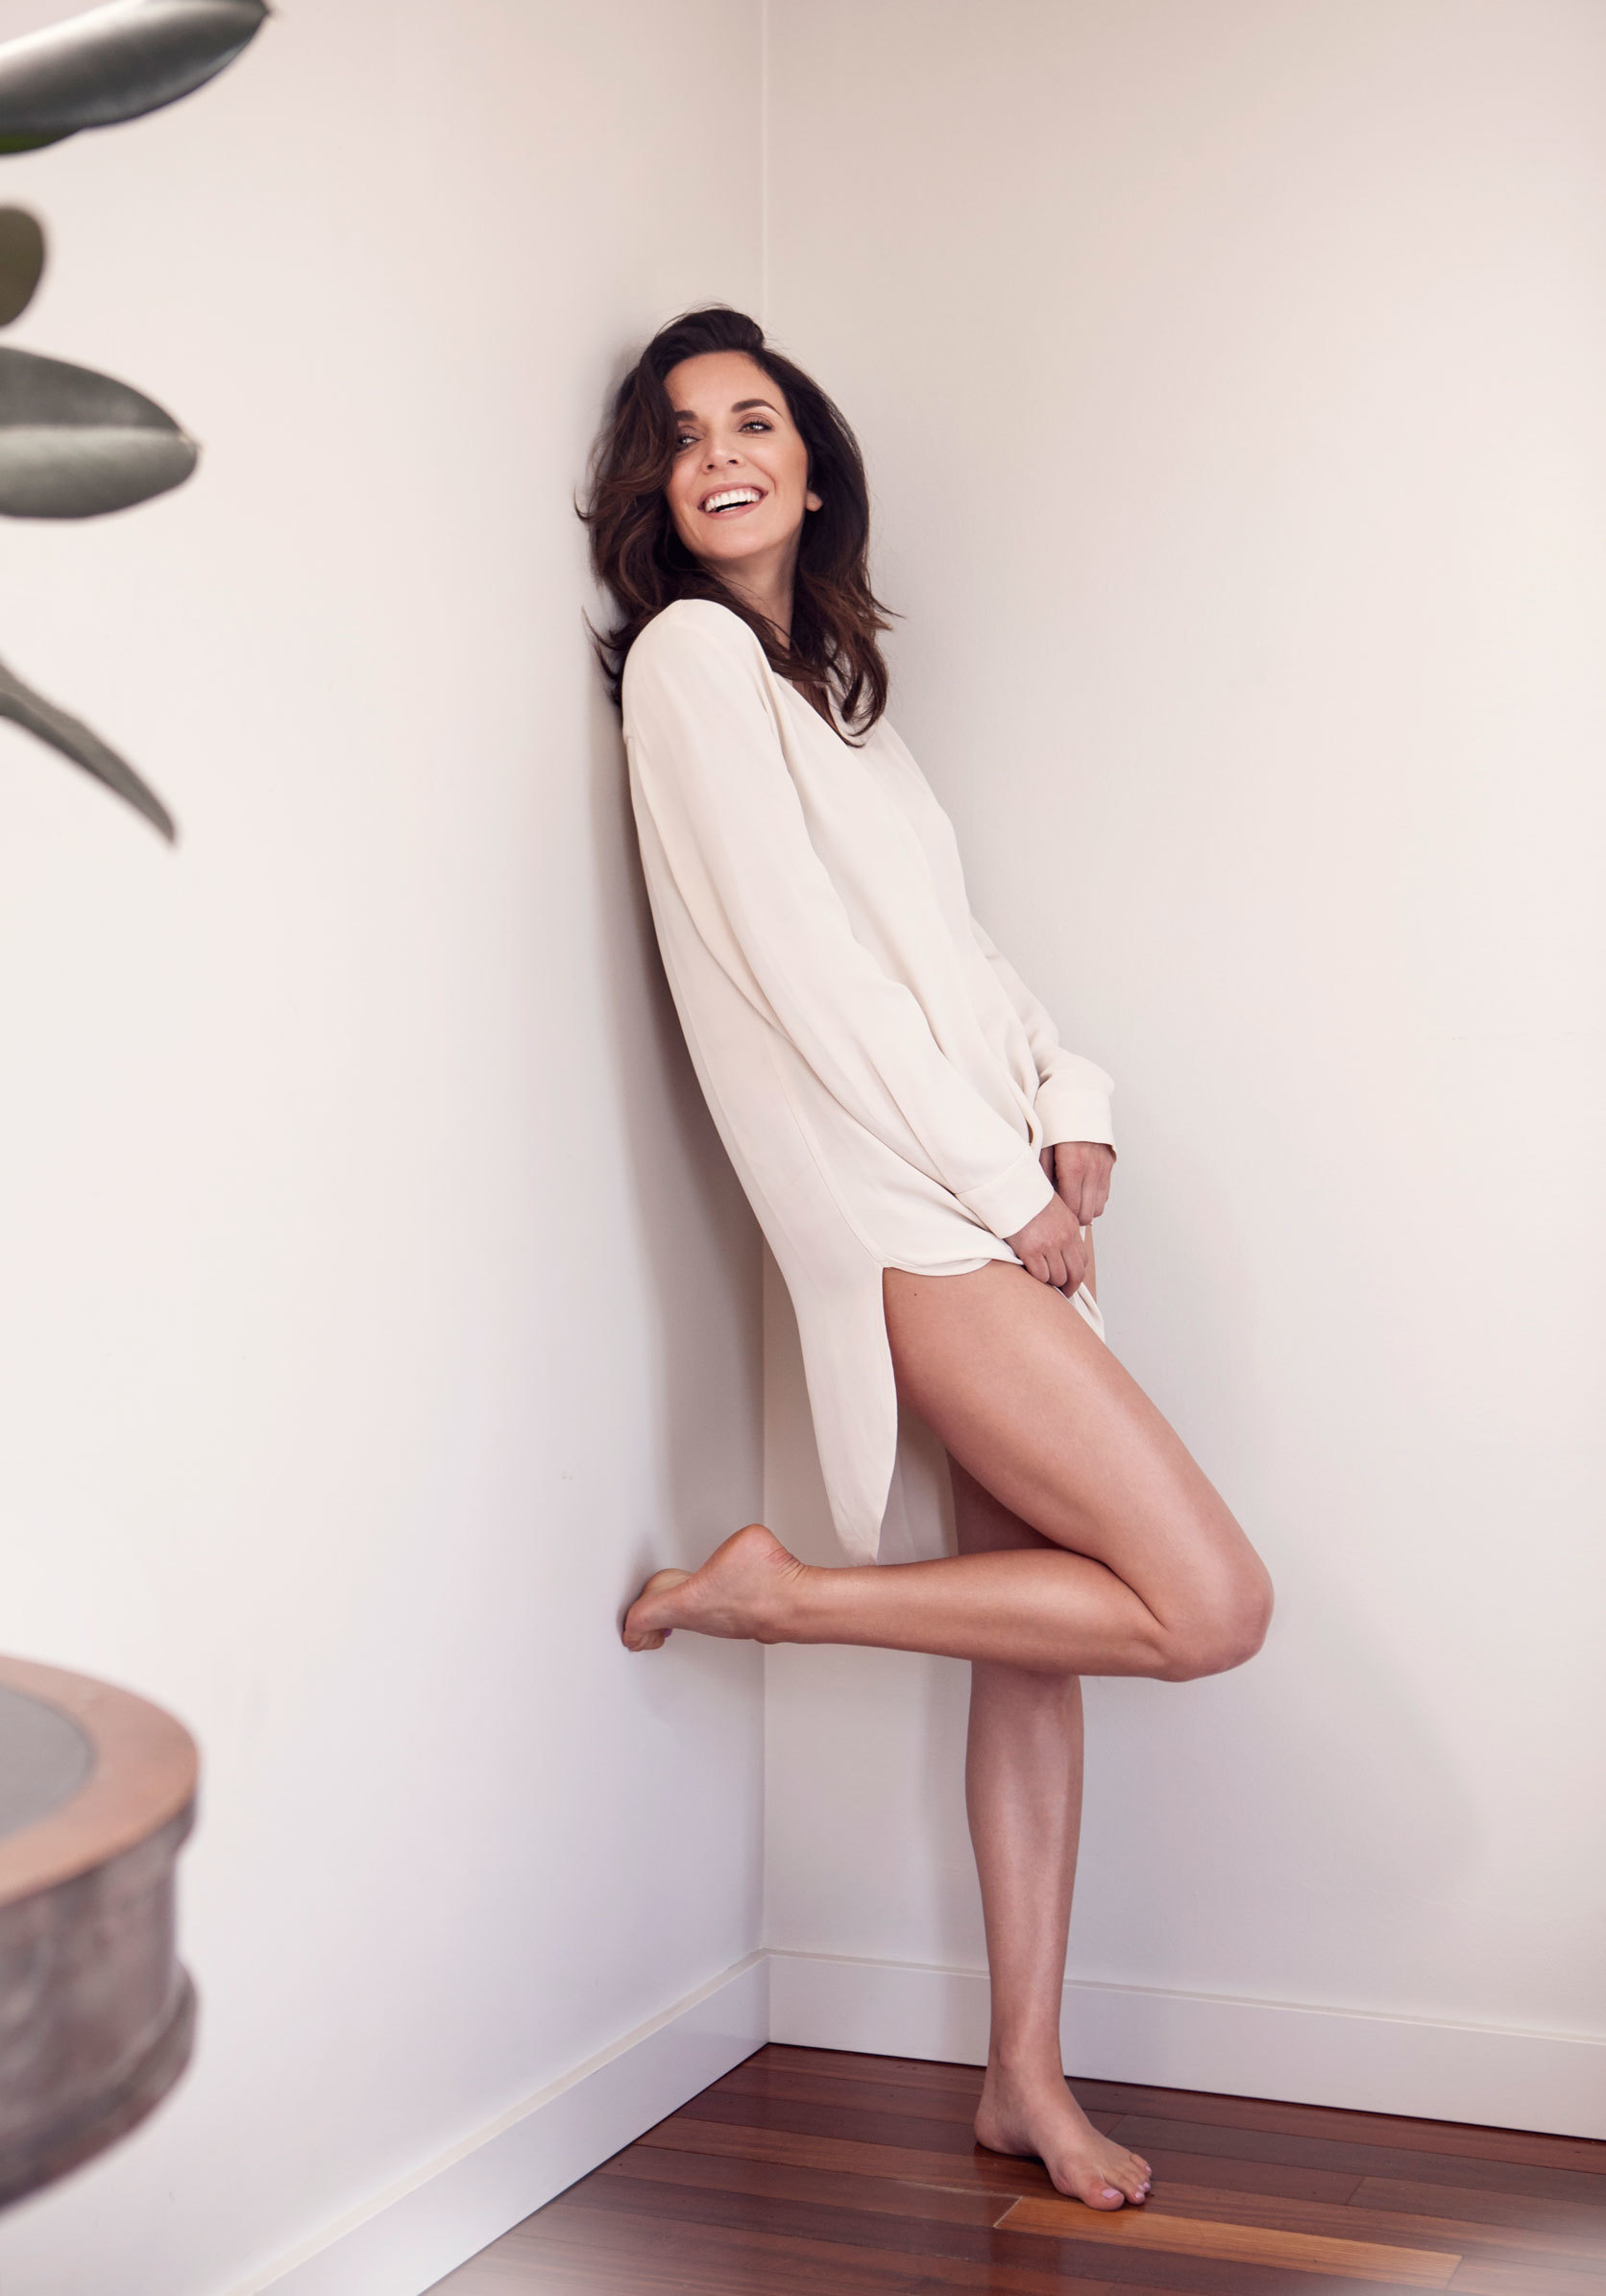 Feet Beth Morgan nudes (38 foto and video), Tits, Fappening, Selfie, legs 2020